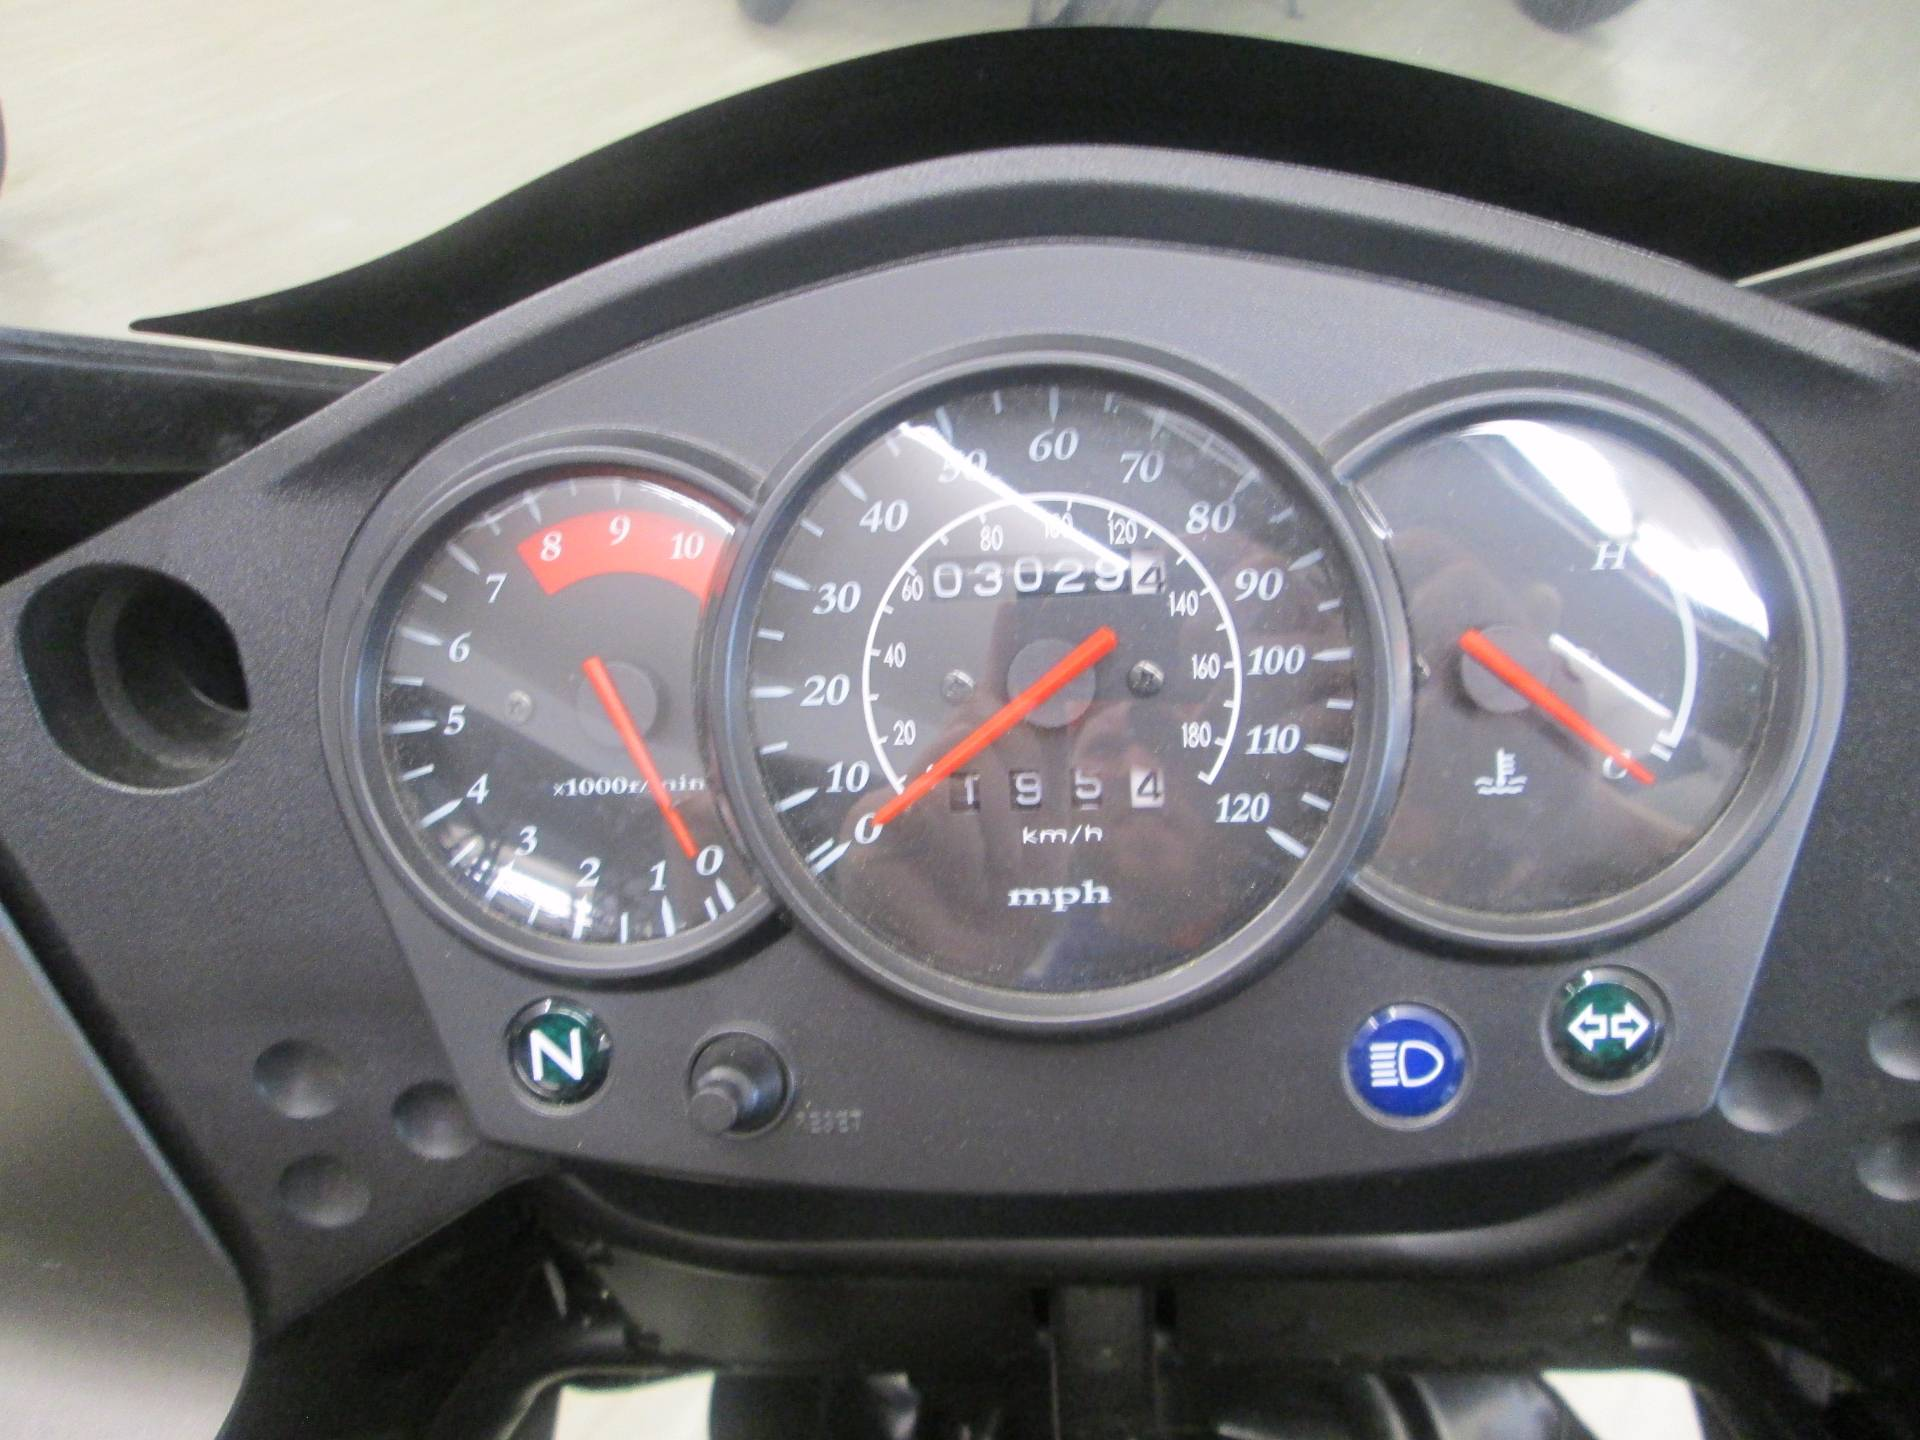 2015 Kawasaki KLR 650 in Dearborn Heights, Michigan